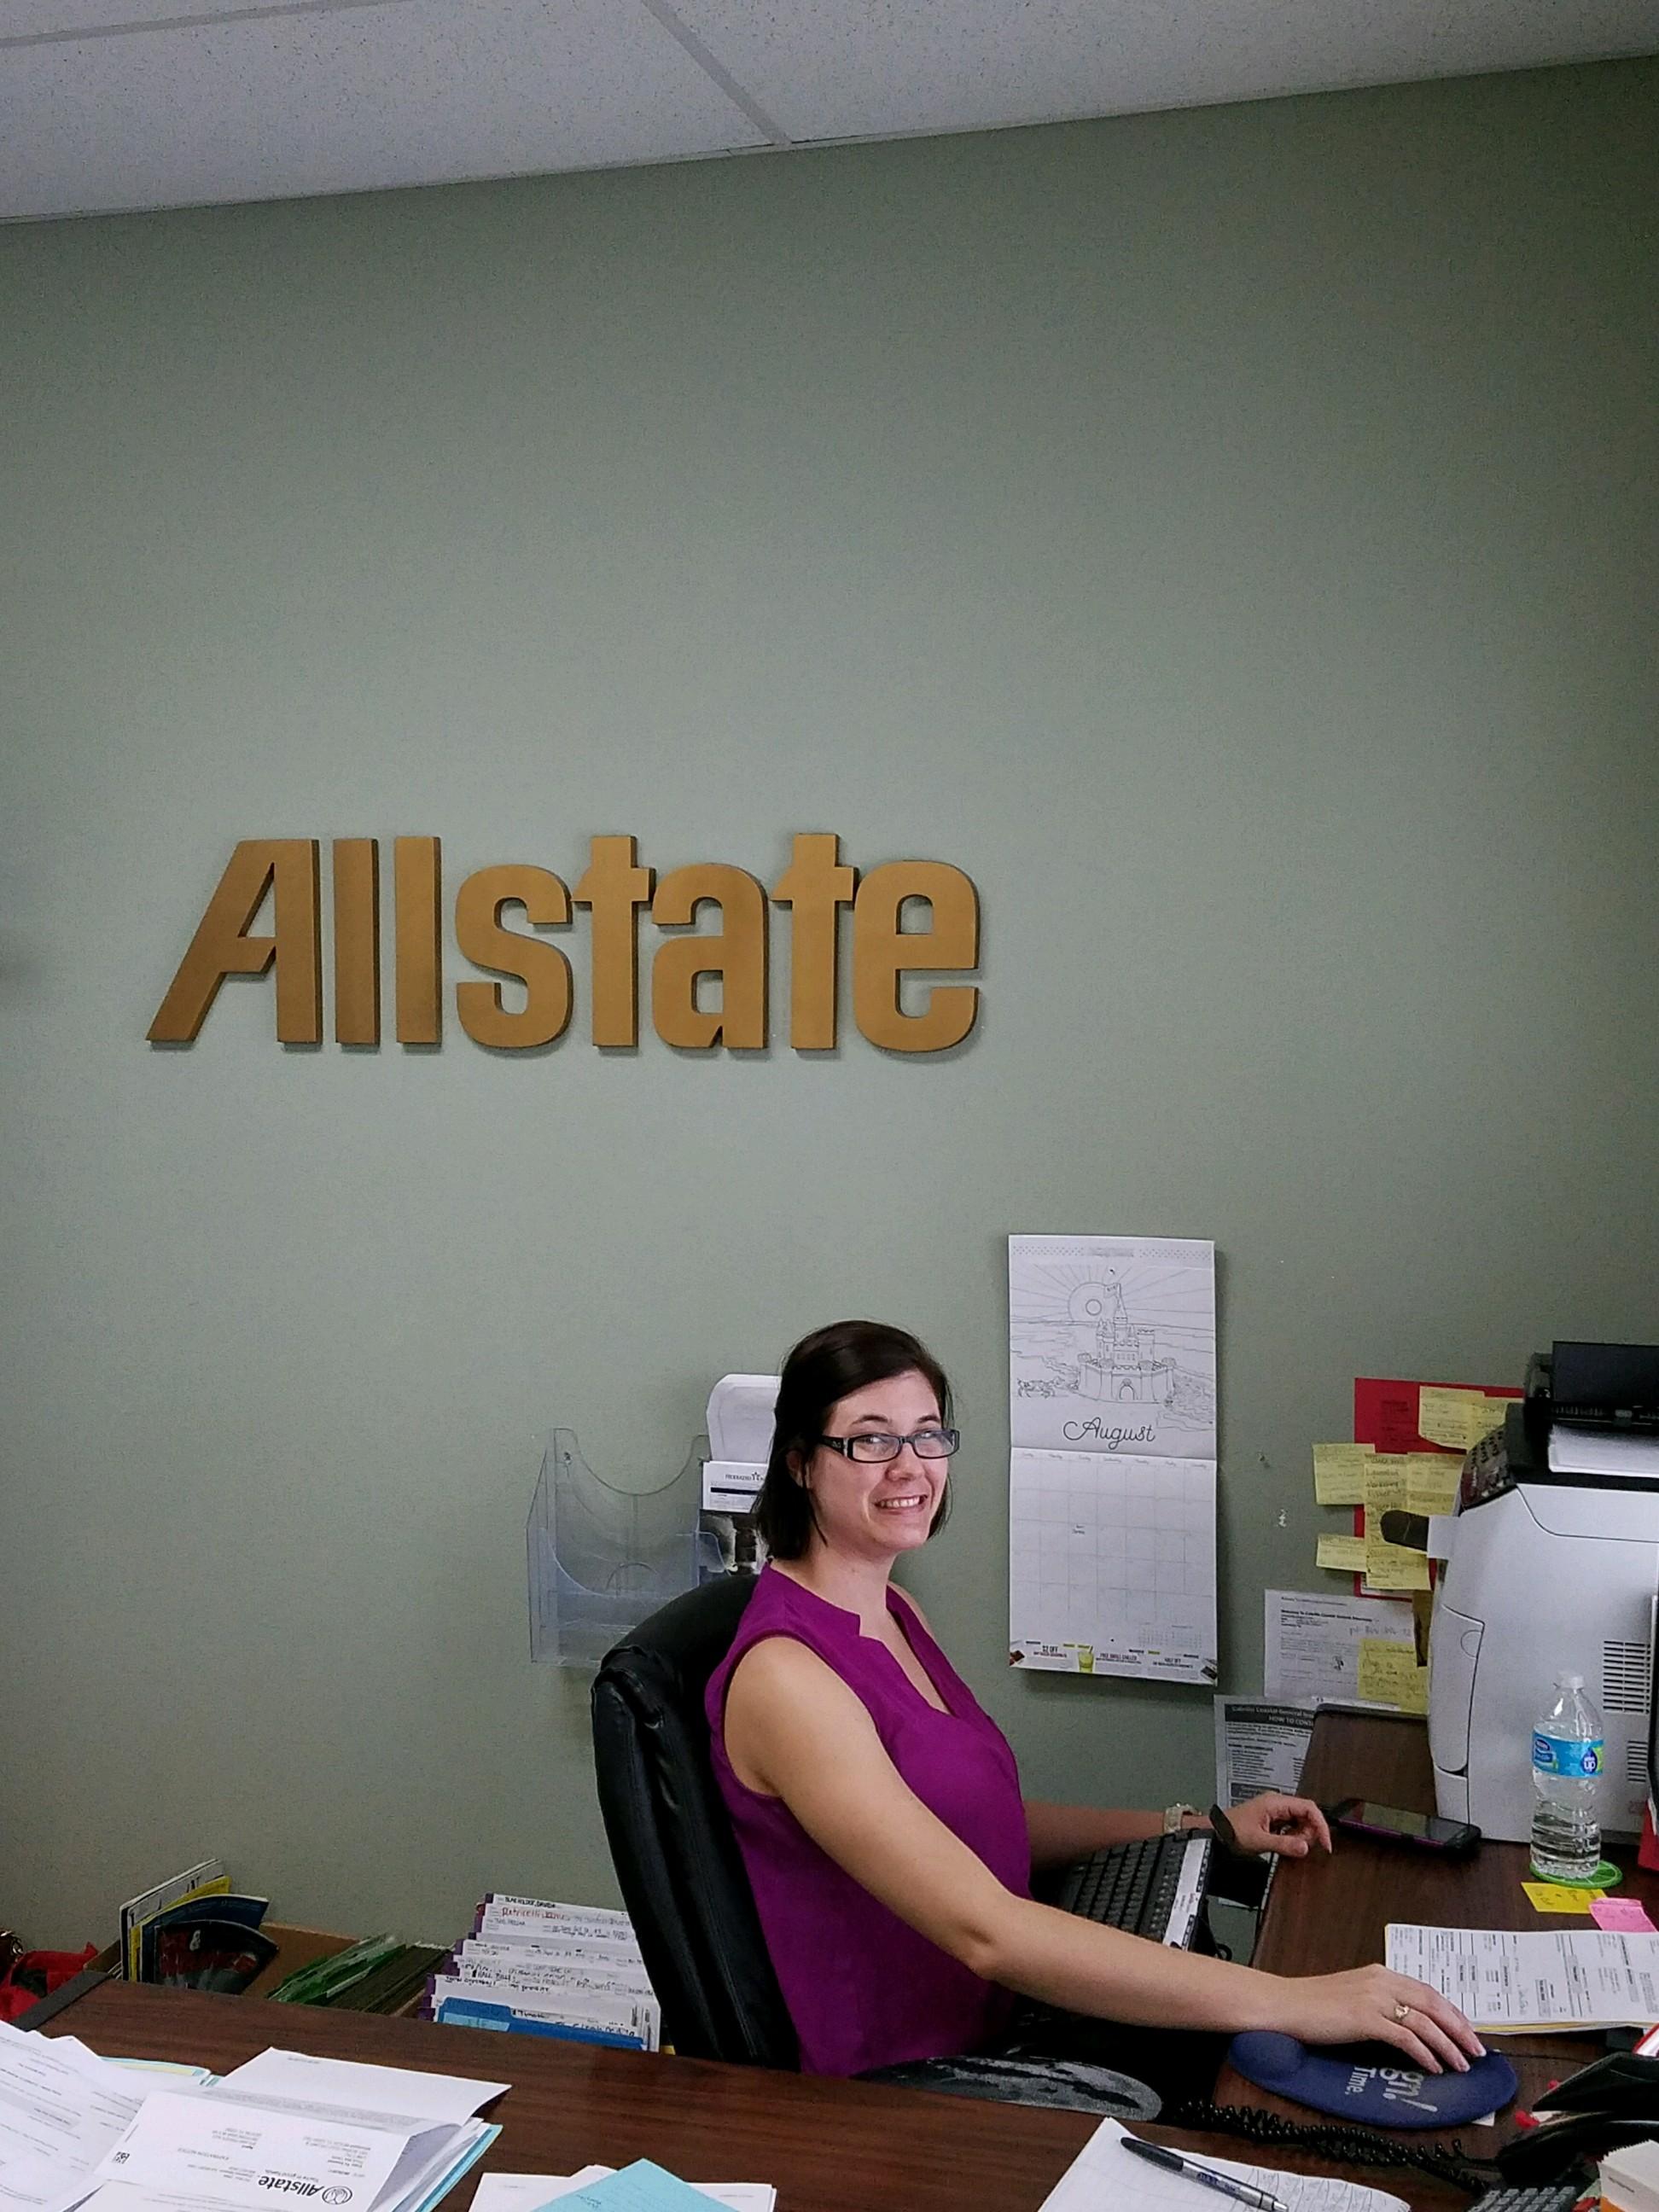 Harold Fisher: Allstate Insurance image 1